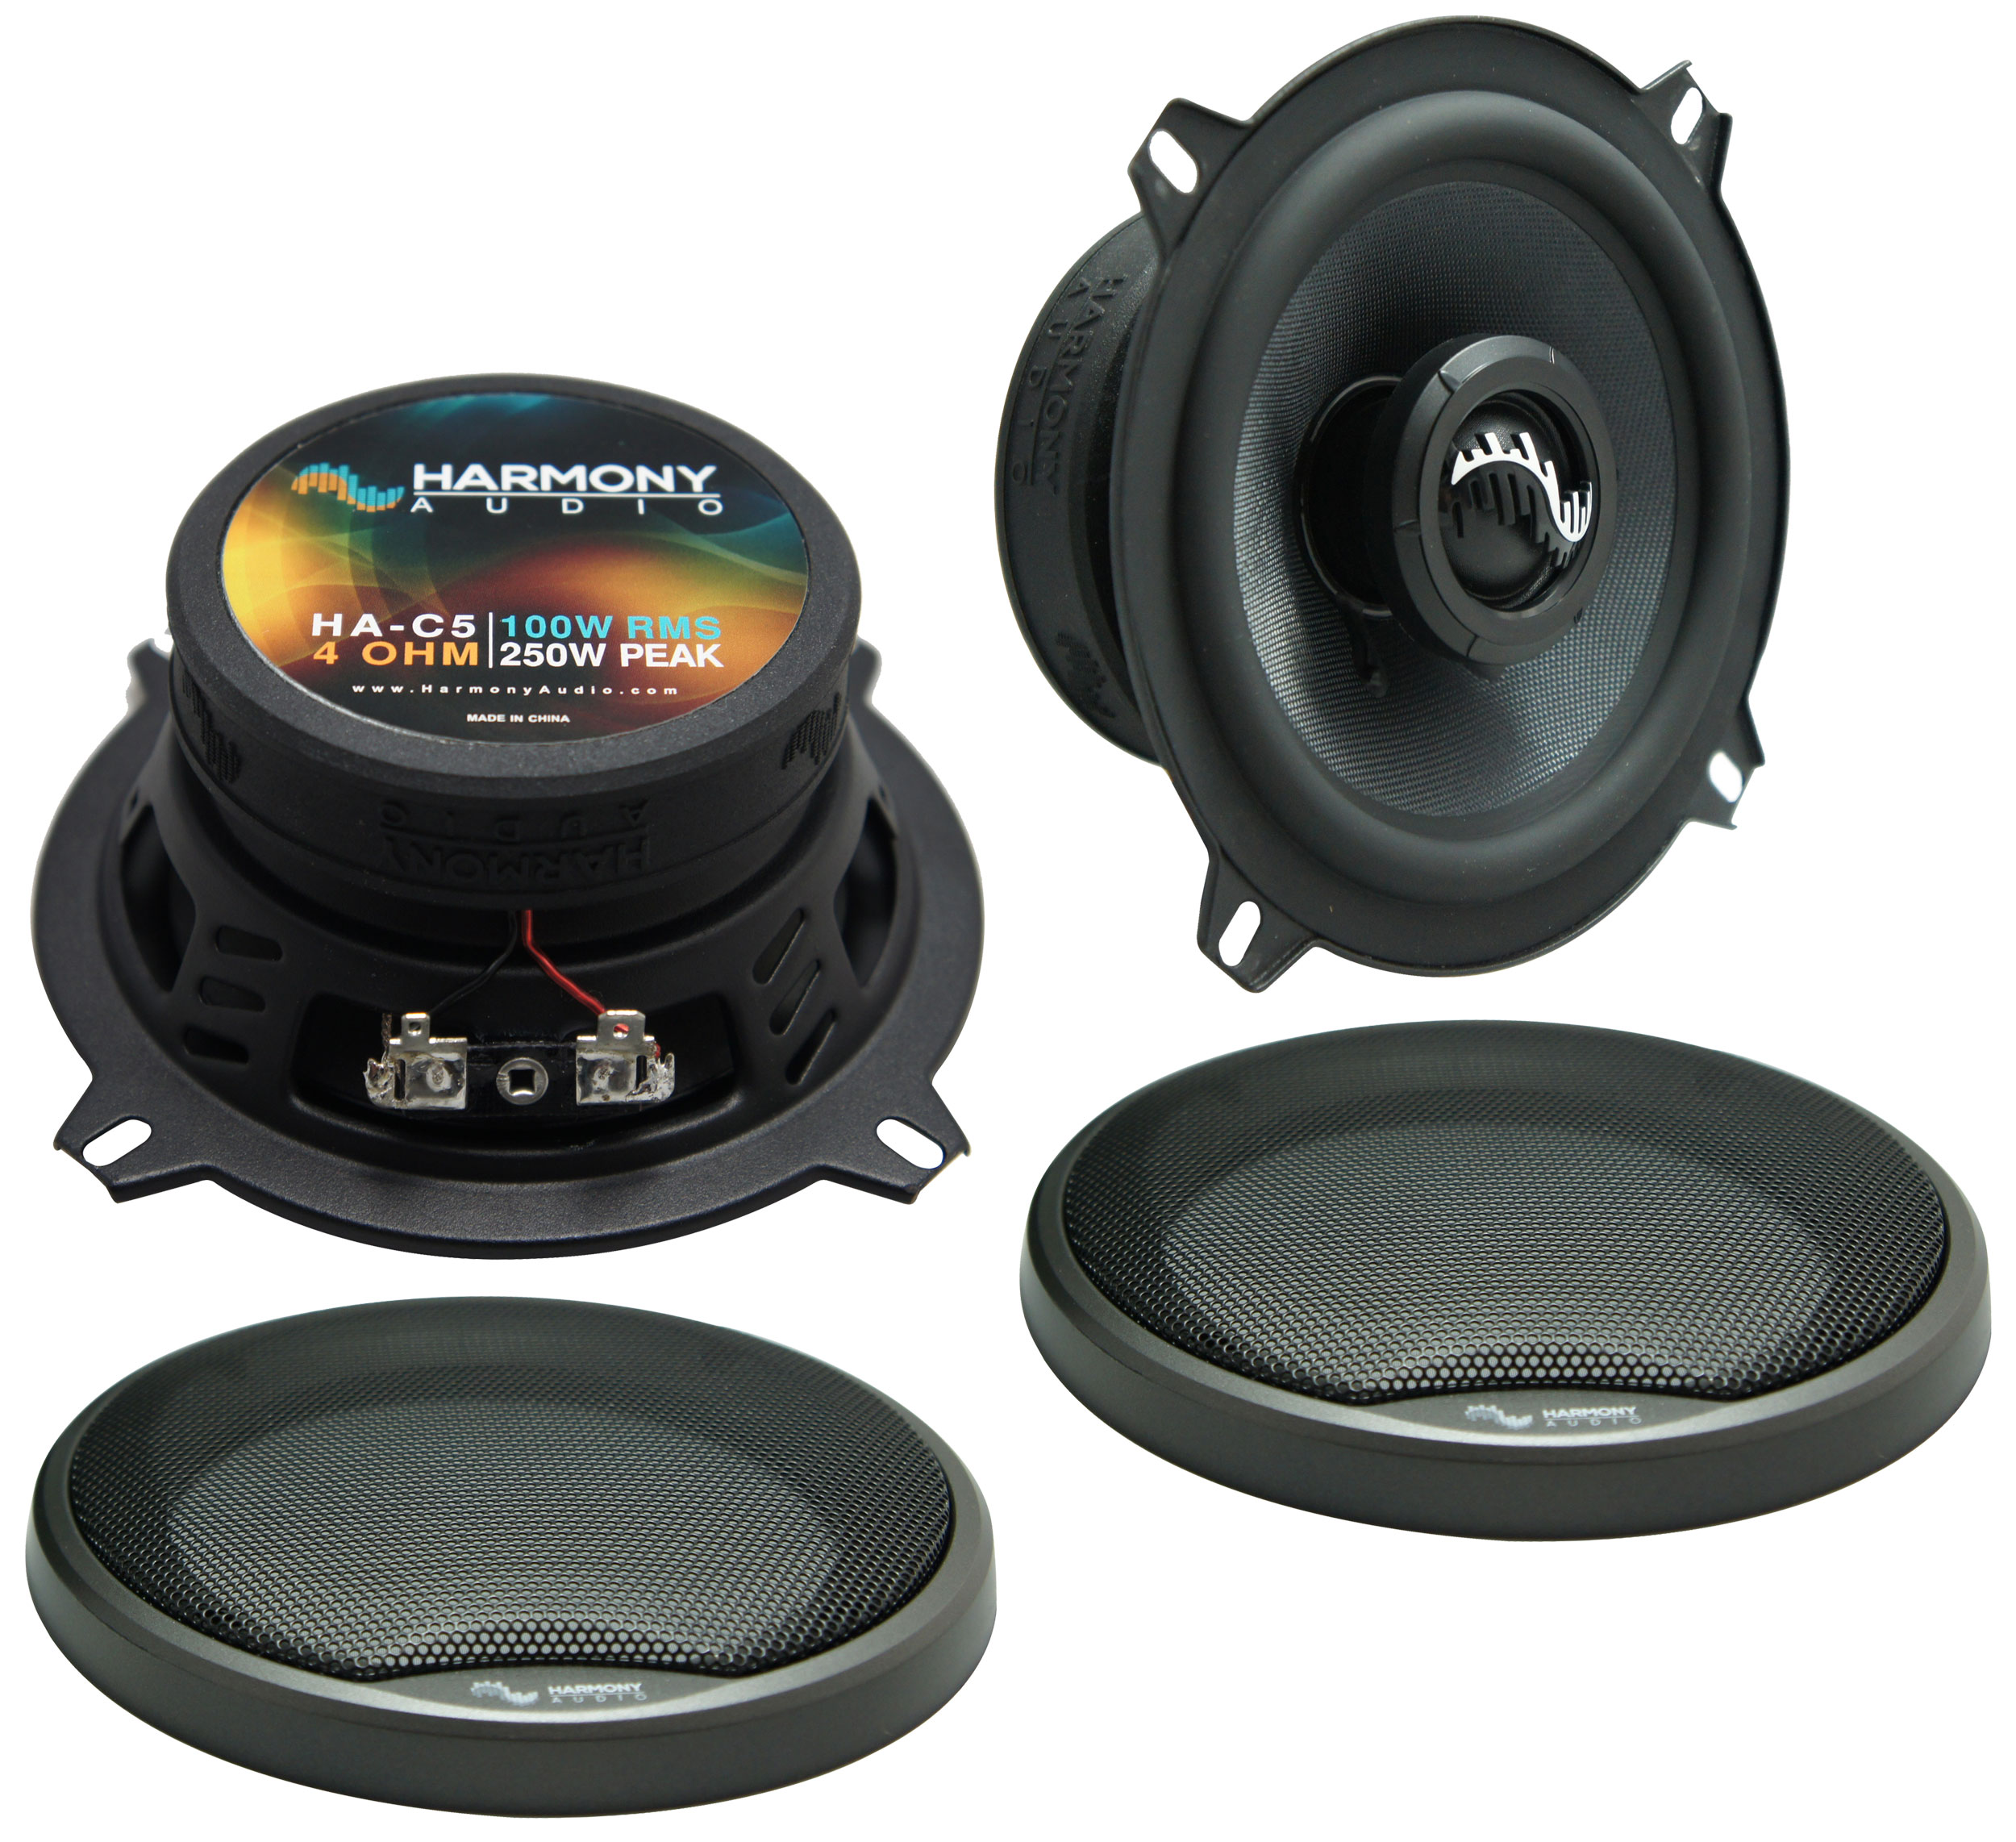 Fits Ford Ranger 1989-1993 Front Door Replacement Harmony HA-C5 Premium Speakers New